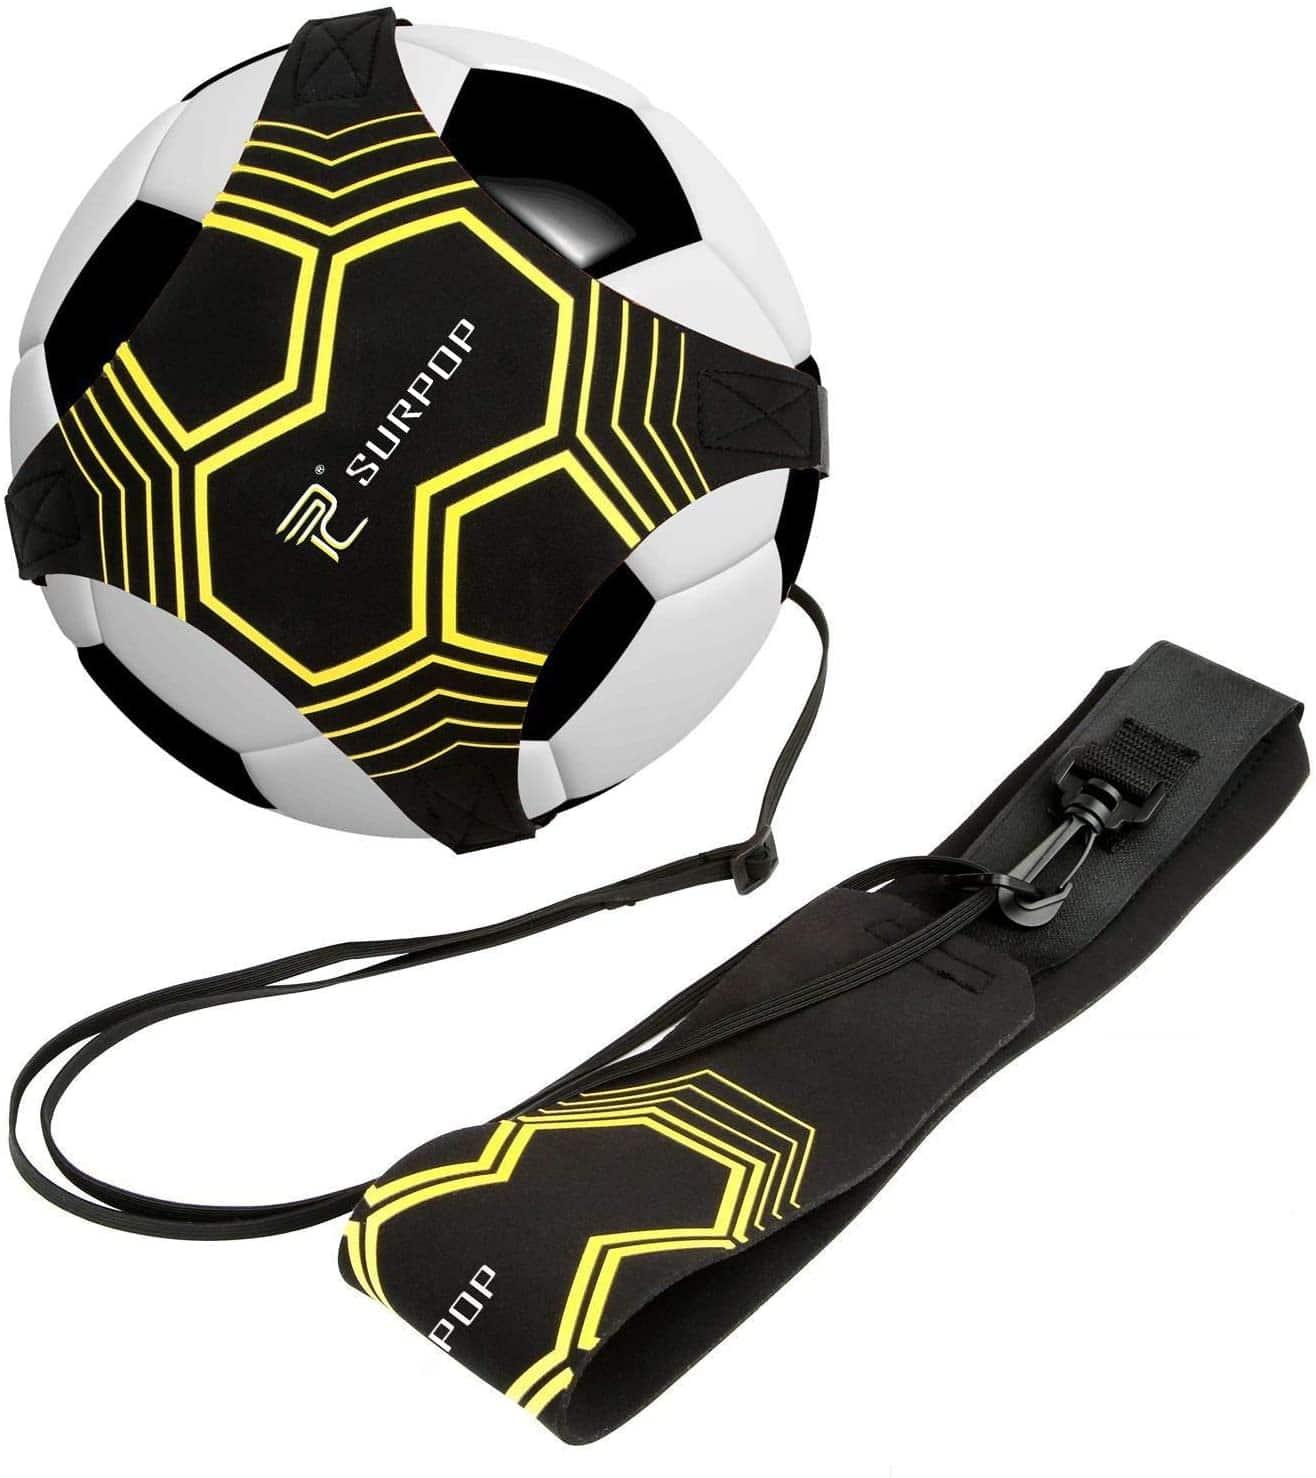 Global Park Football Kick Throw Solo Practice Aid.